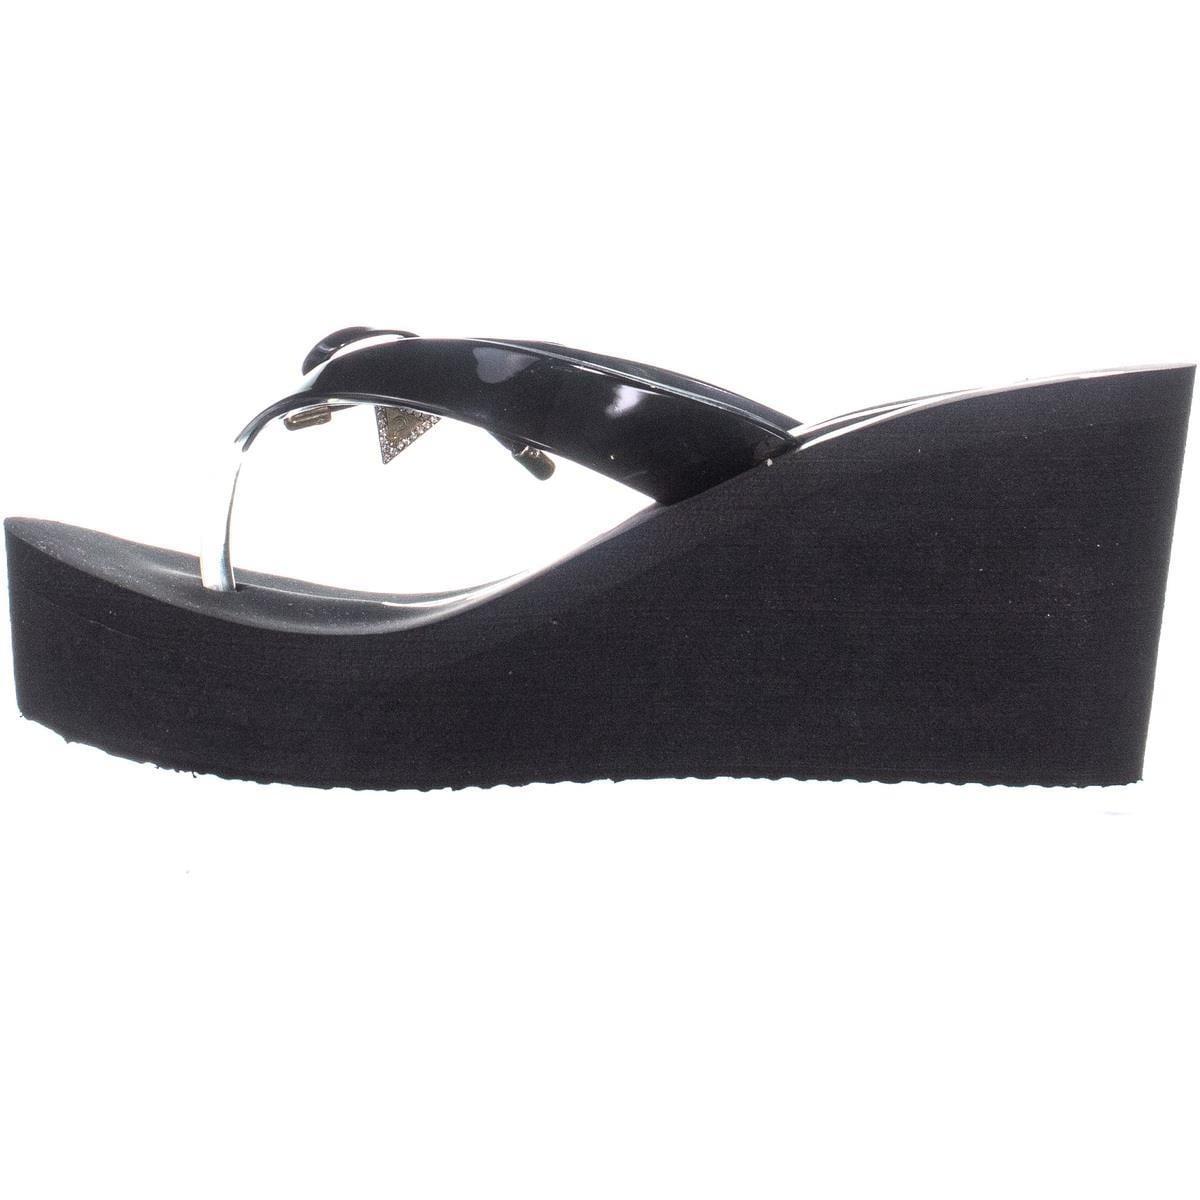 87781ce13 Shop Guess Syona Slip On Platform Wedge Sandals